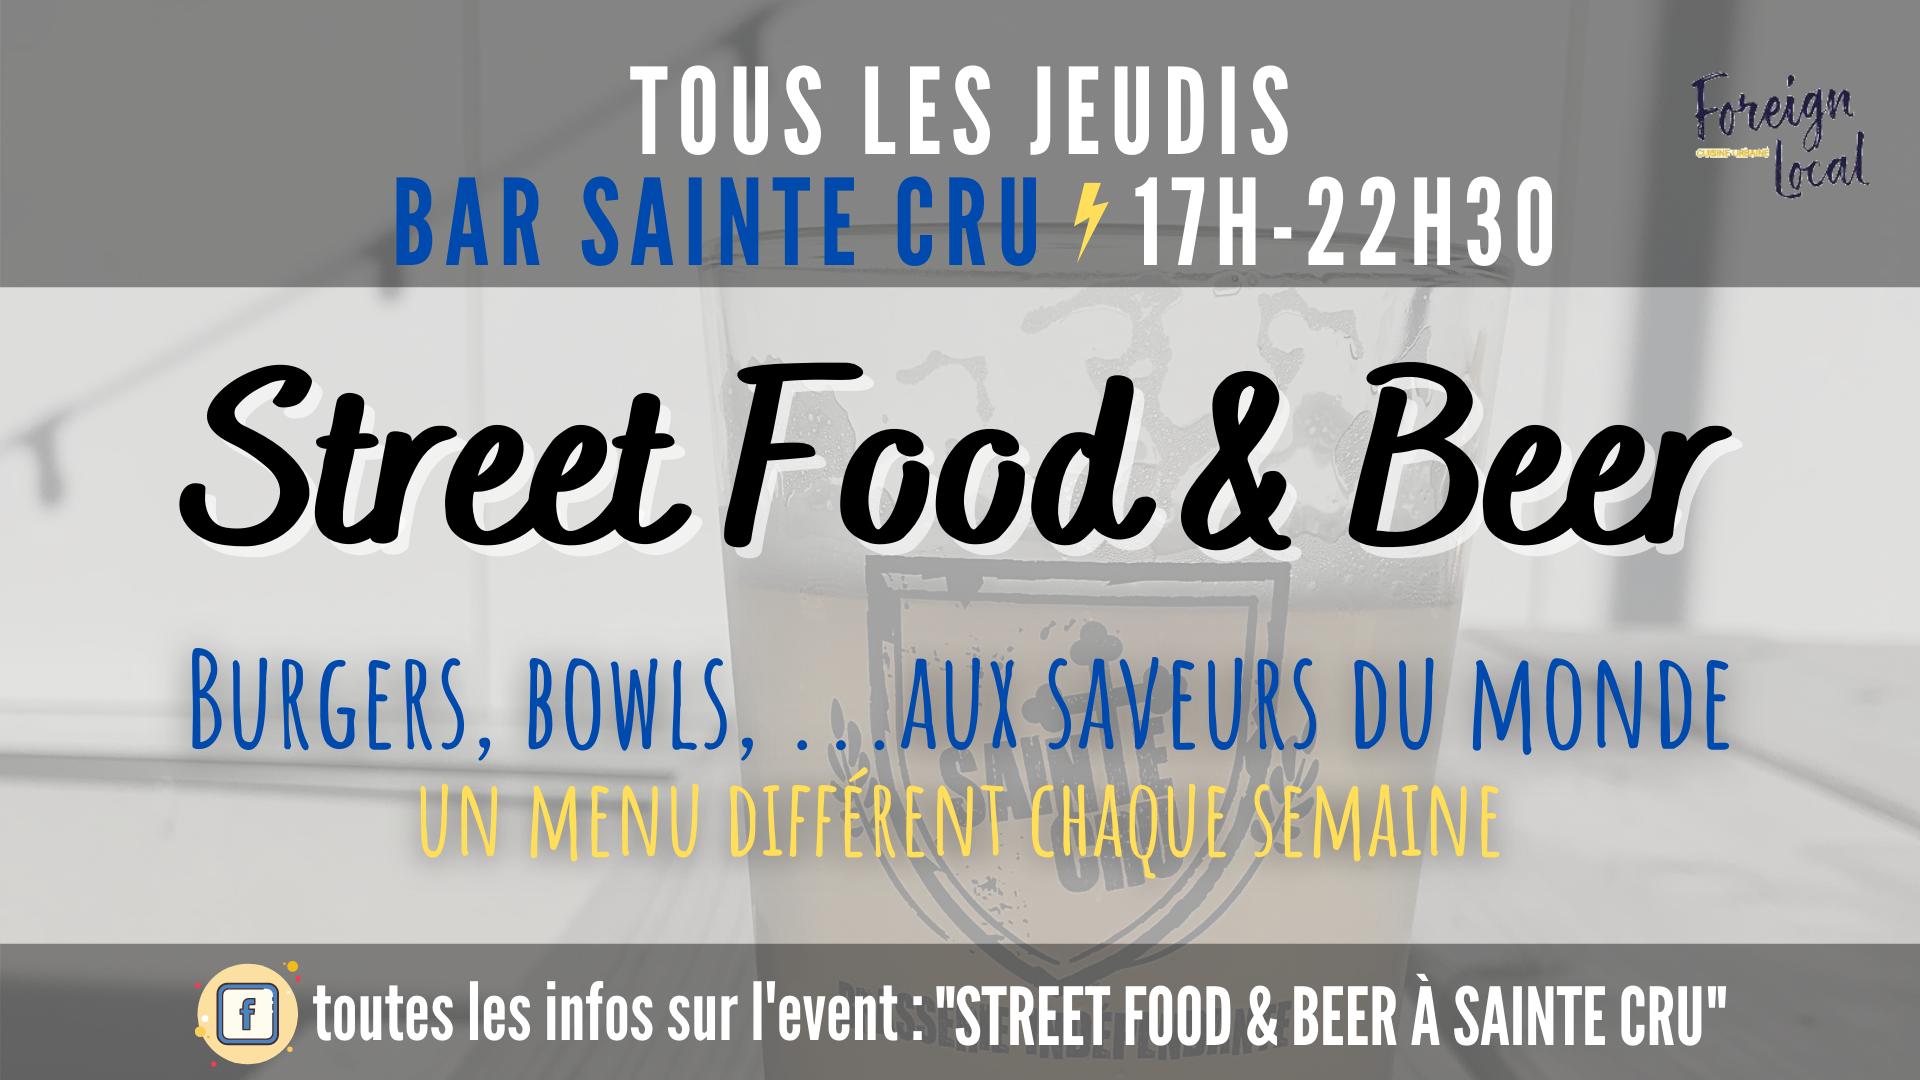 Tous les jeudis street food à Sainte Cru